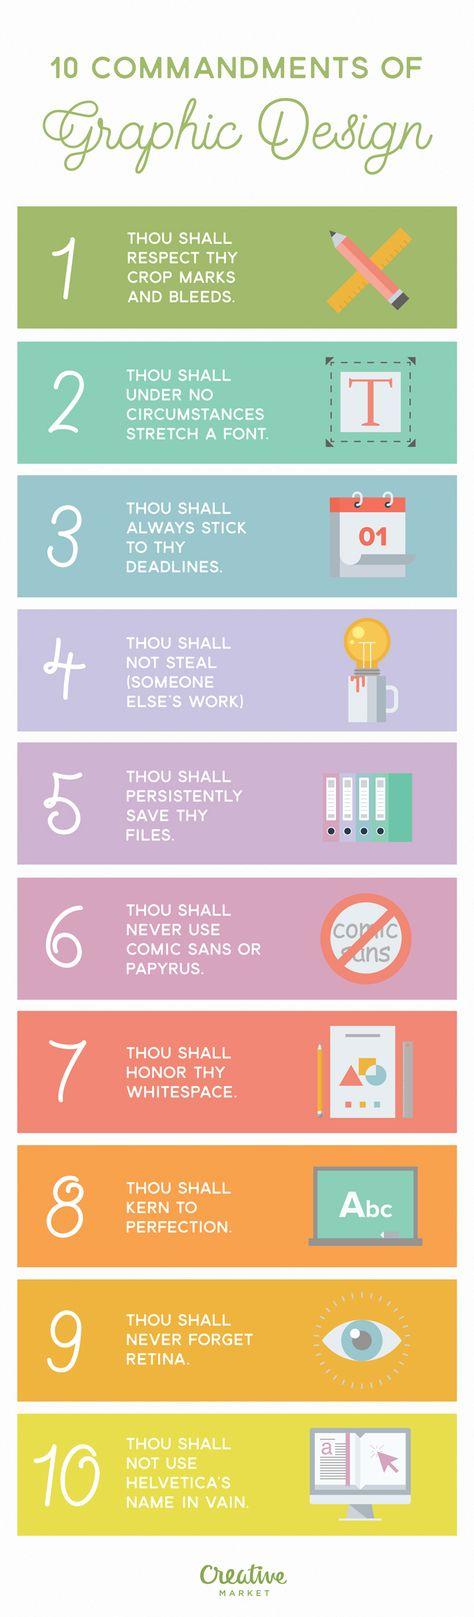 Infographic: 10 Commandments of Graphic Design